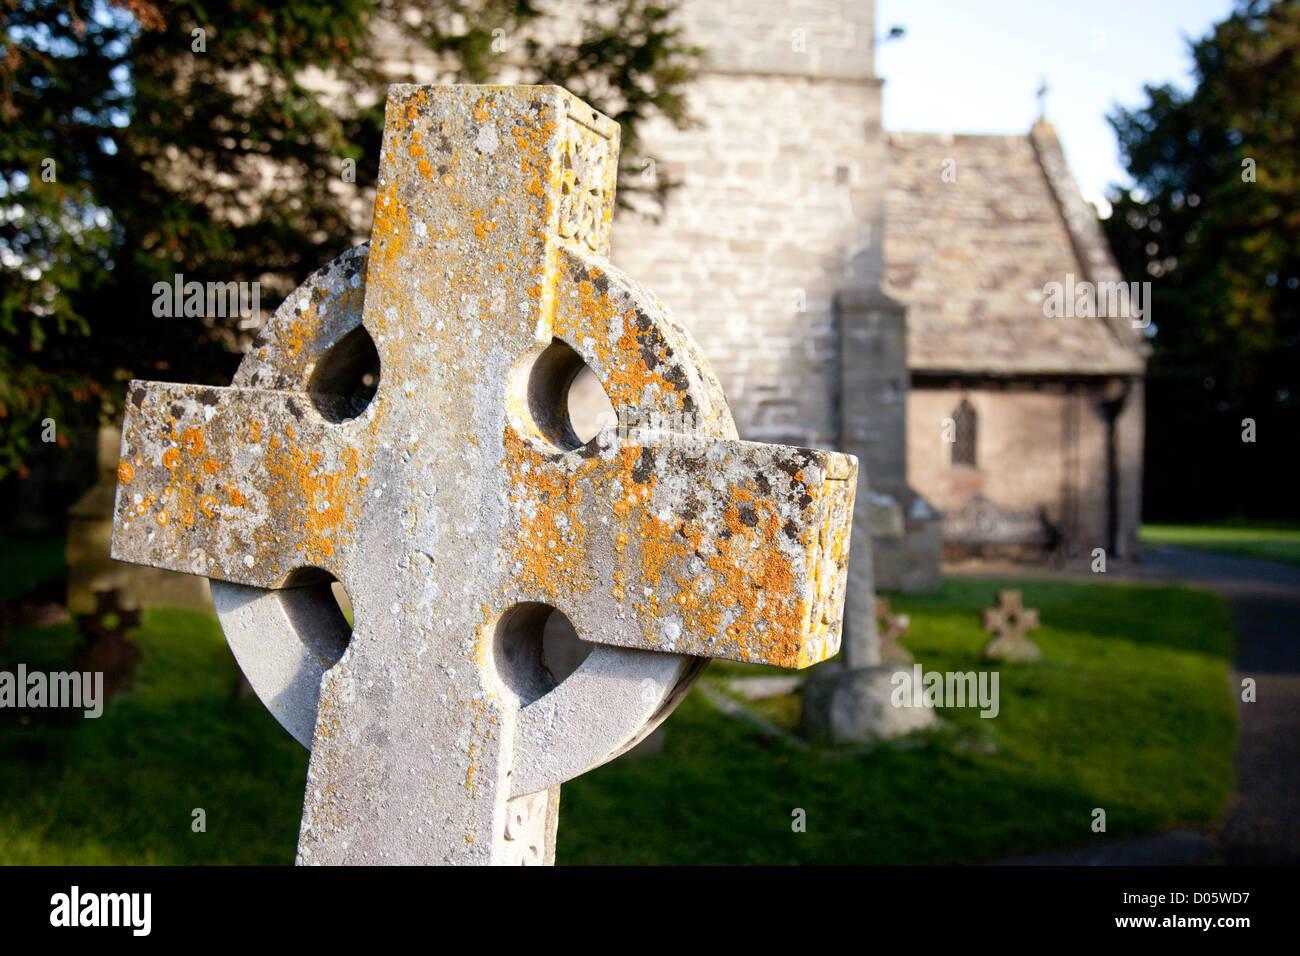 A cross in the churchyard, Church of St Mary the Virgin, Eardisland, Herefordshire UK - Stock Image